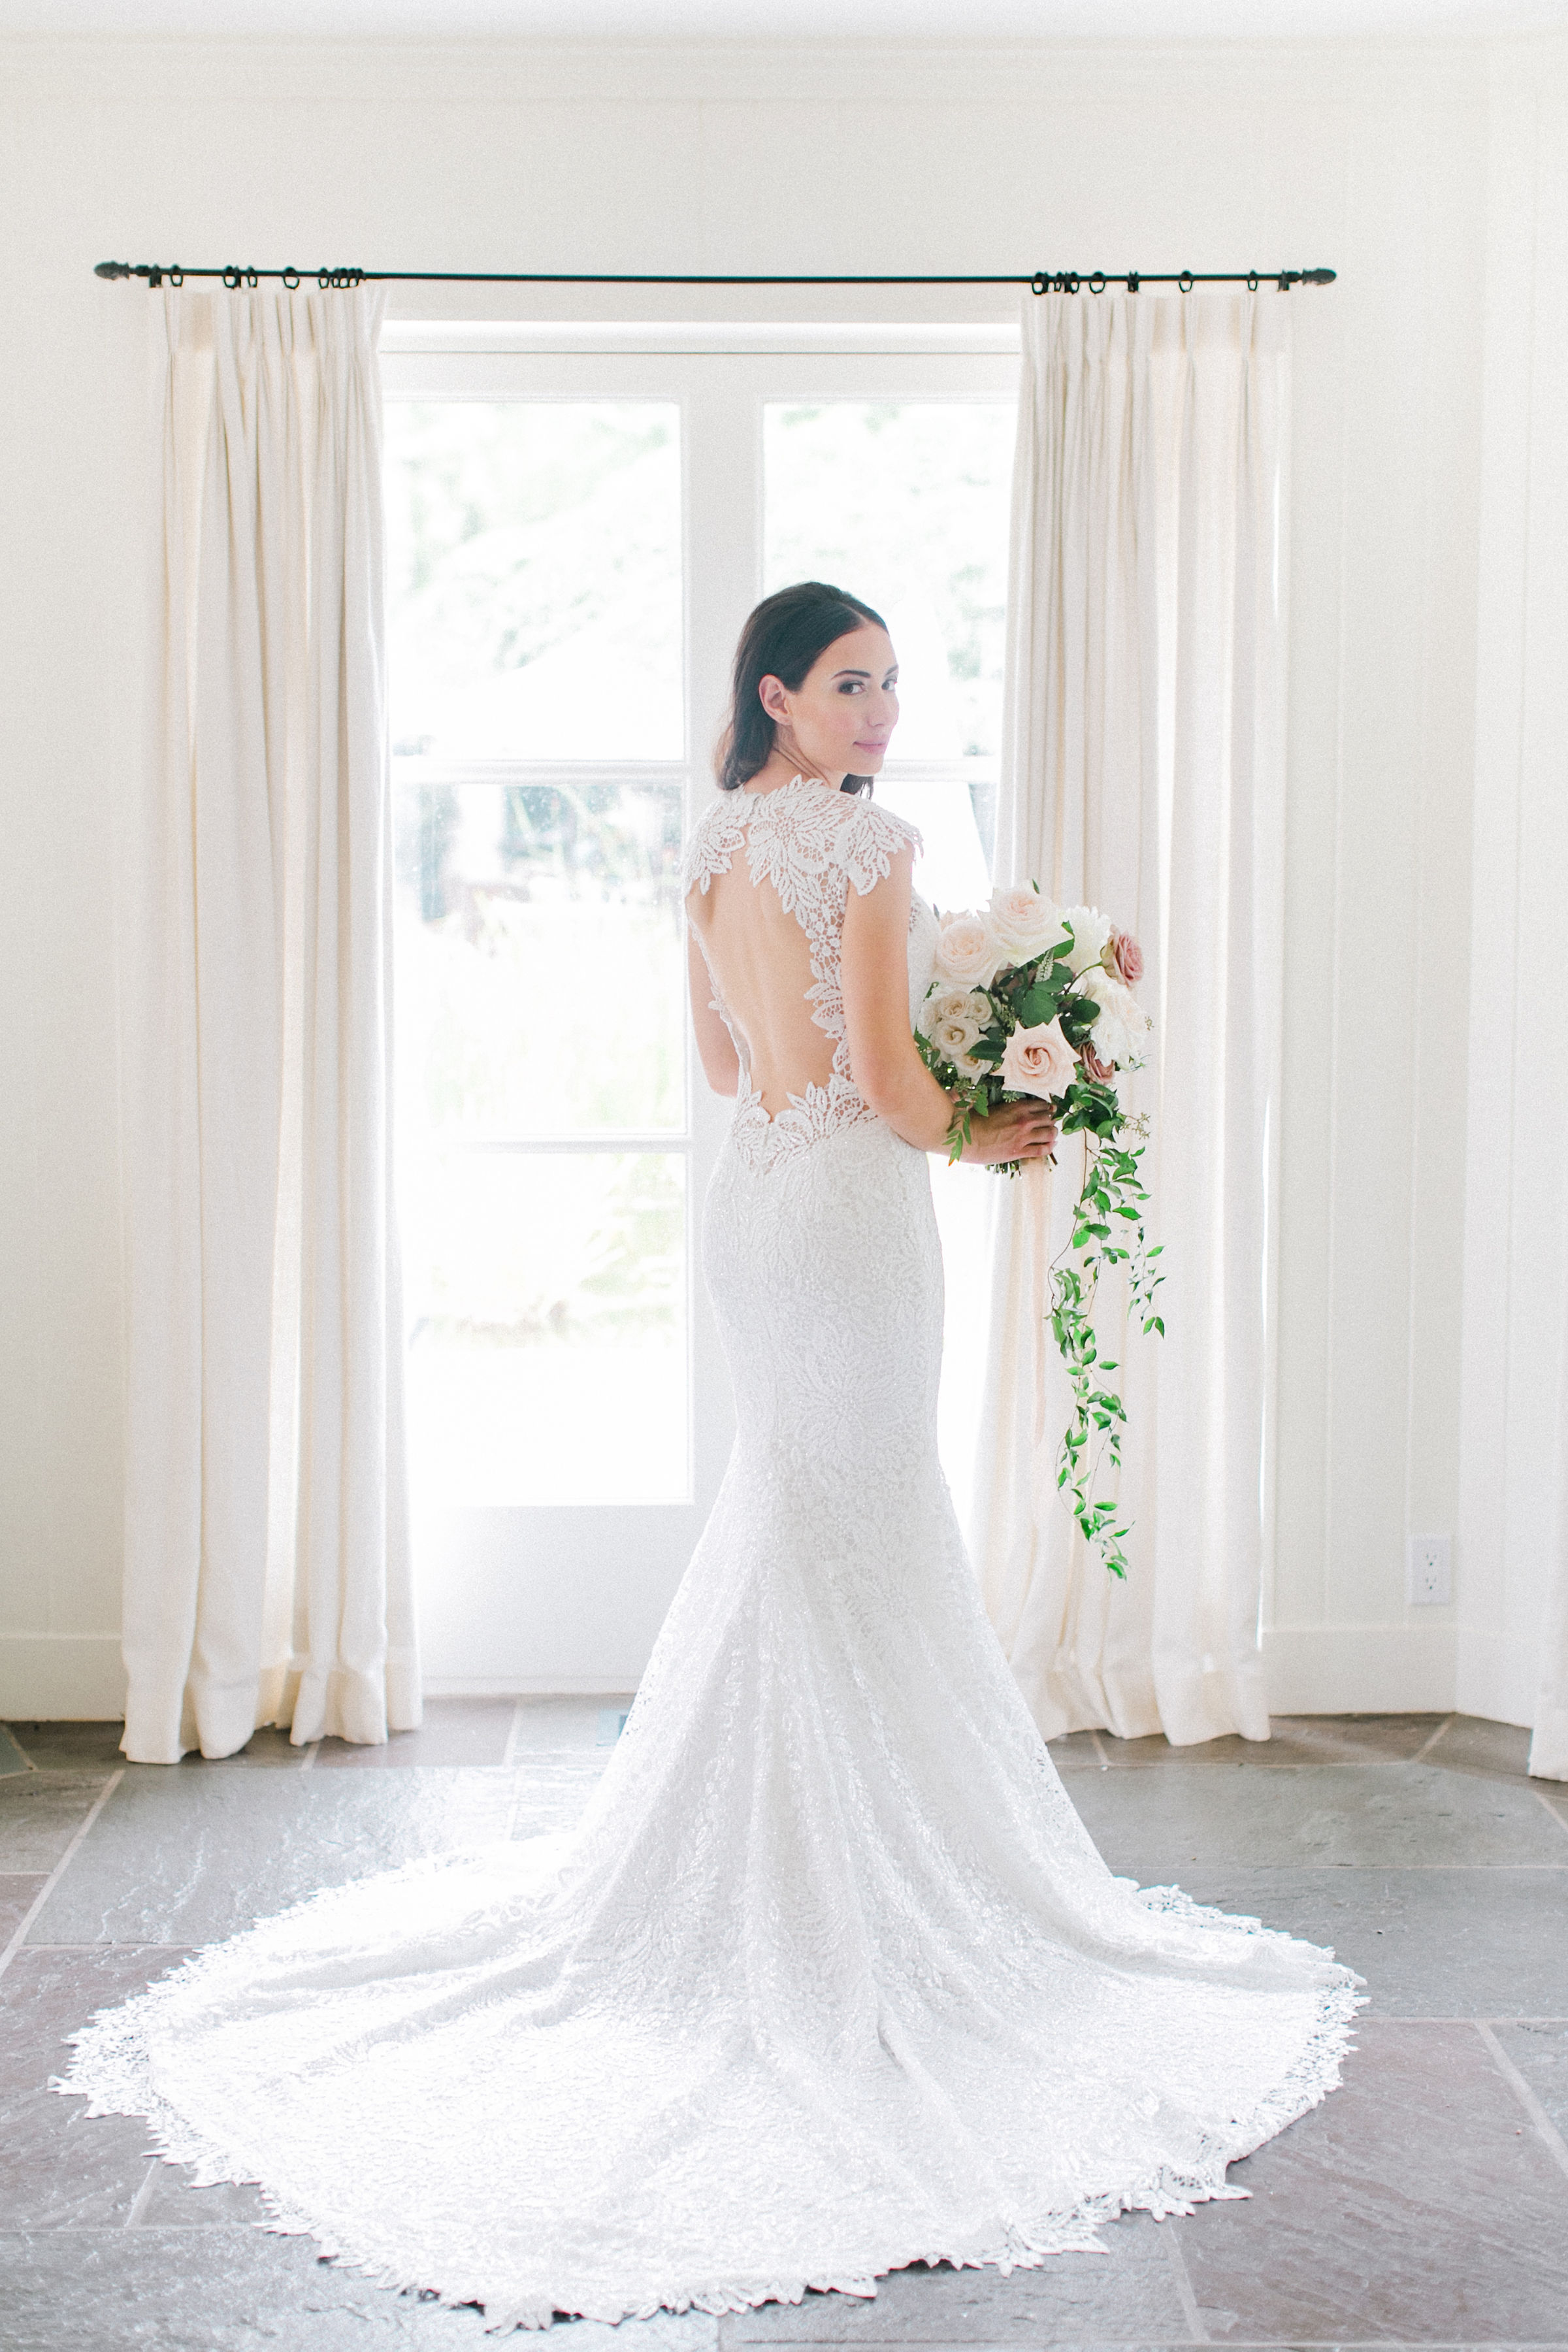 langdon-hall-wedding-toronto-photographer-soft-airy-kurtz-bre-tom-firshade-121.jpg